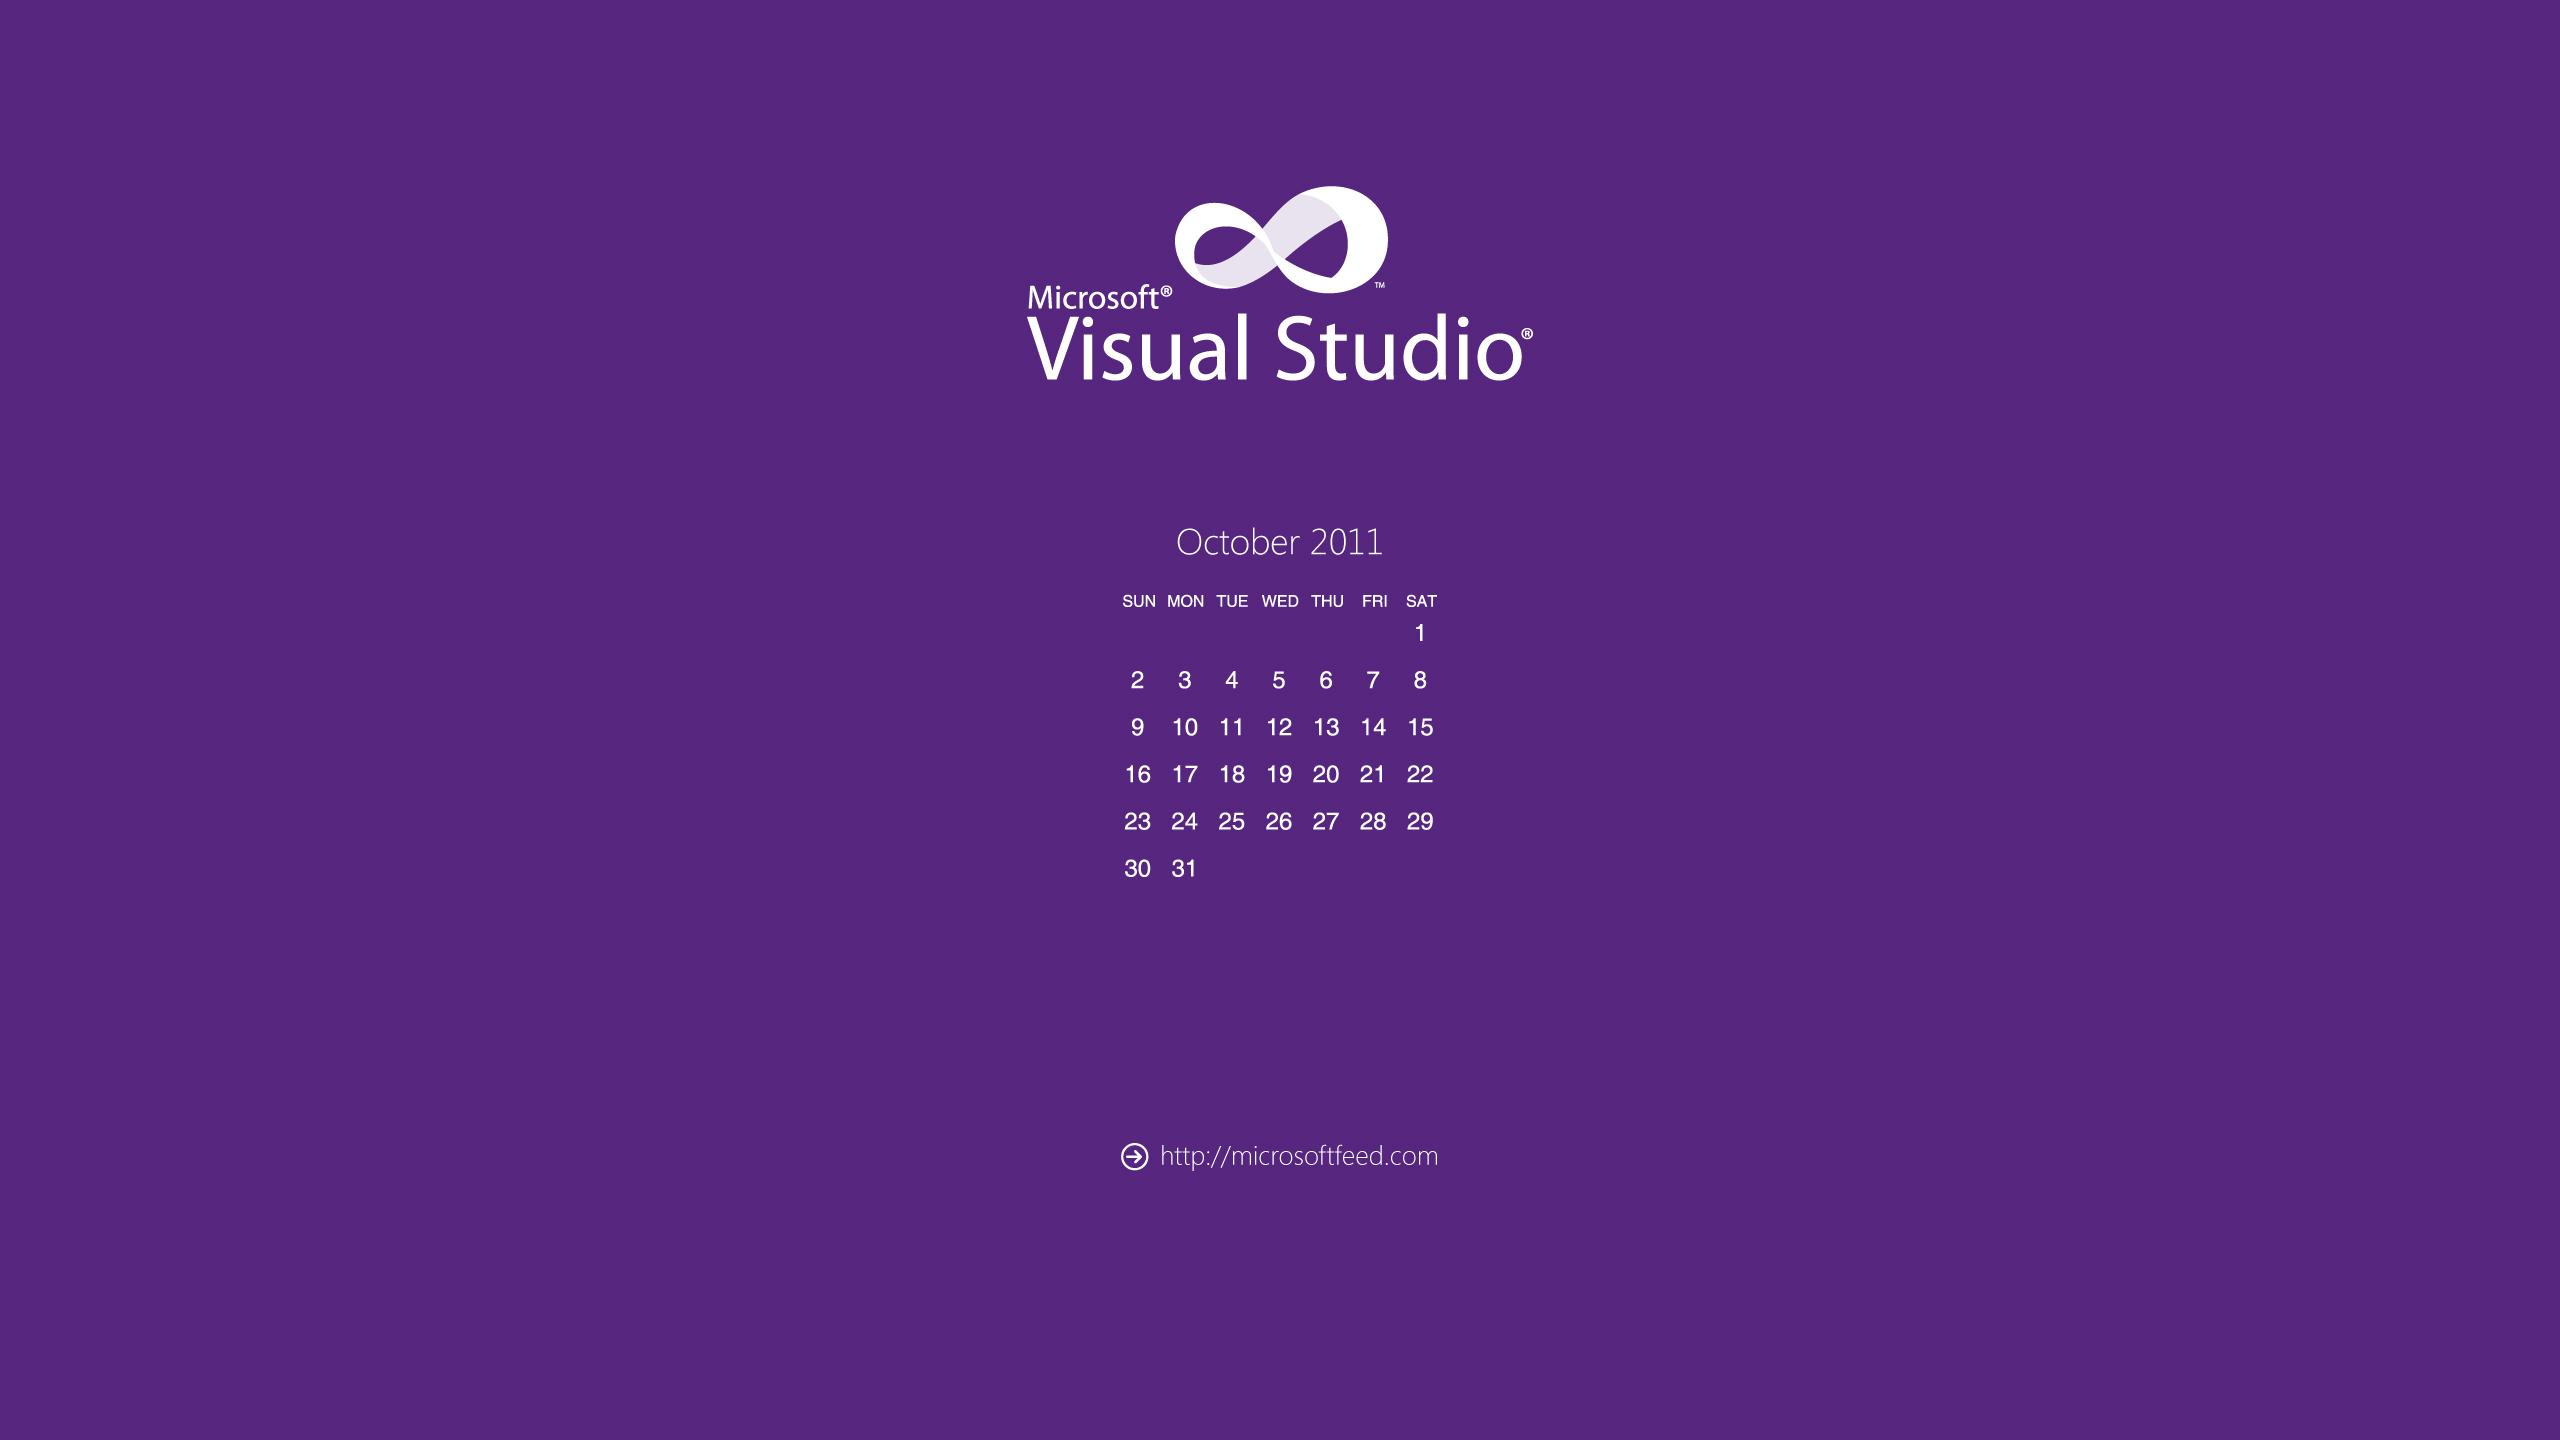 visual studio metro style desktop wallpaper calendar october 2011jpg 2560x1440